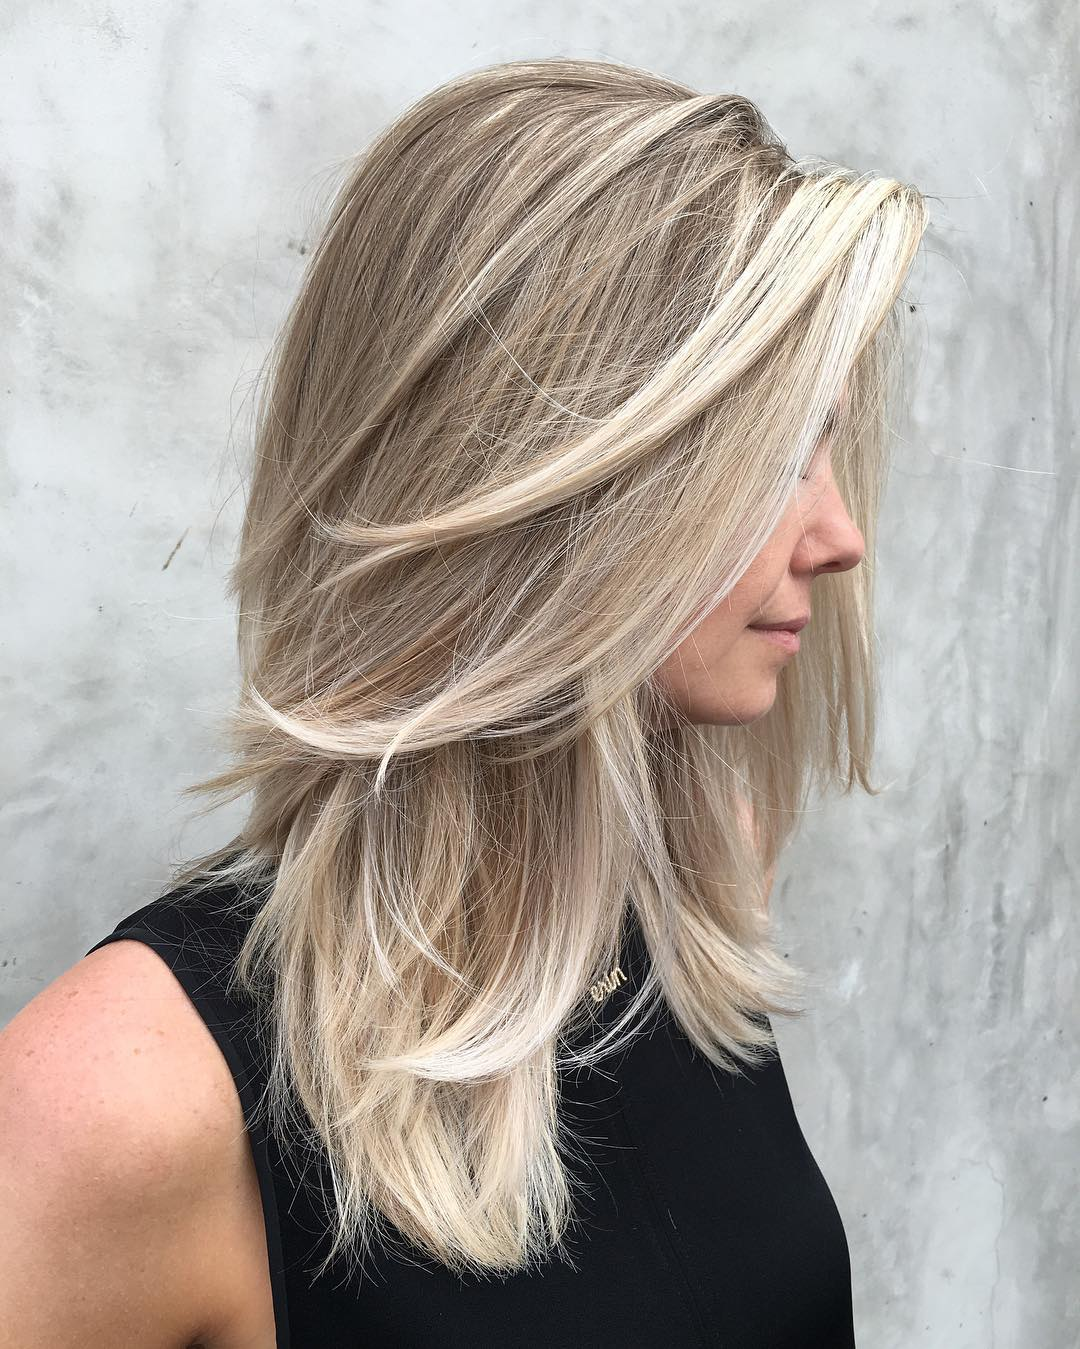 Awe Inspiring Blonde Hairstyles And Haircuts Ideas For 2016 Therighthairstyles Short Hairstyles For Black Women Fulllsitofus